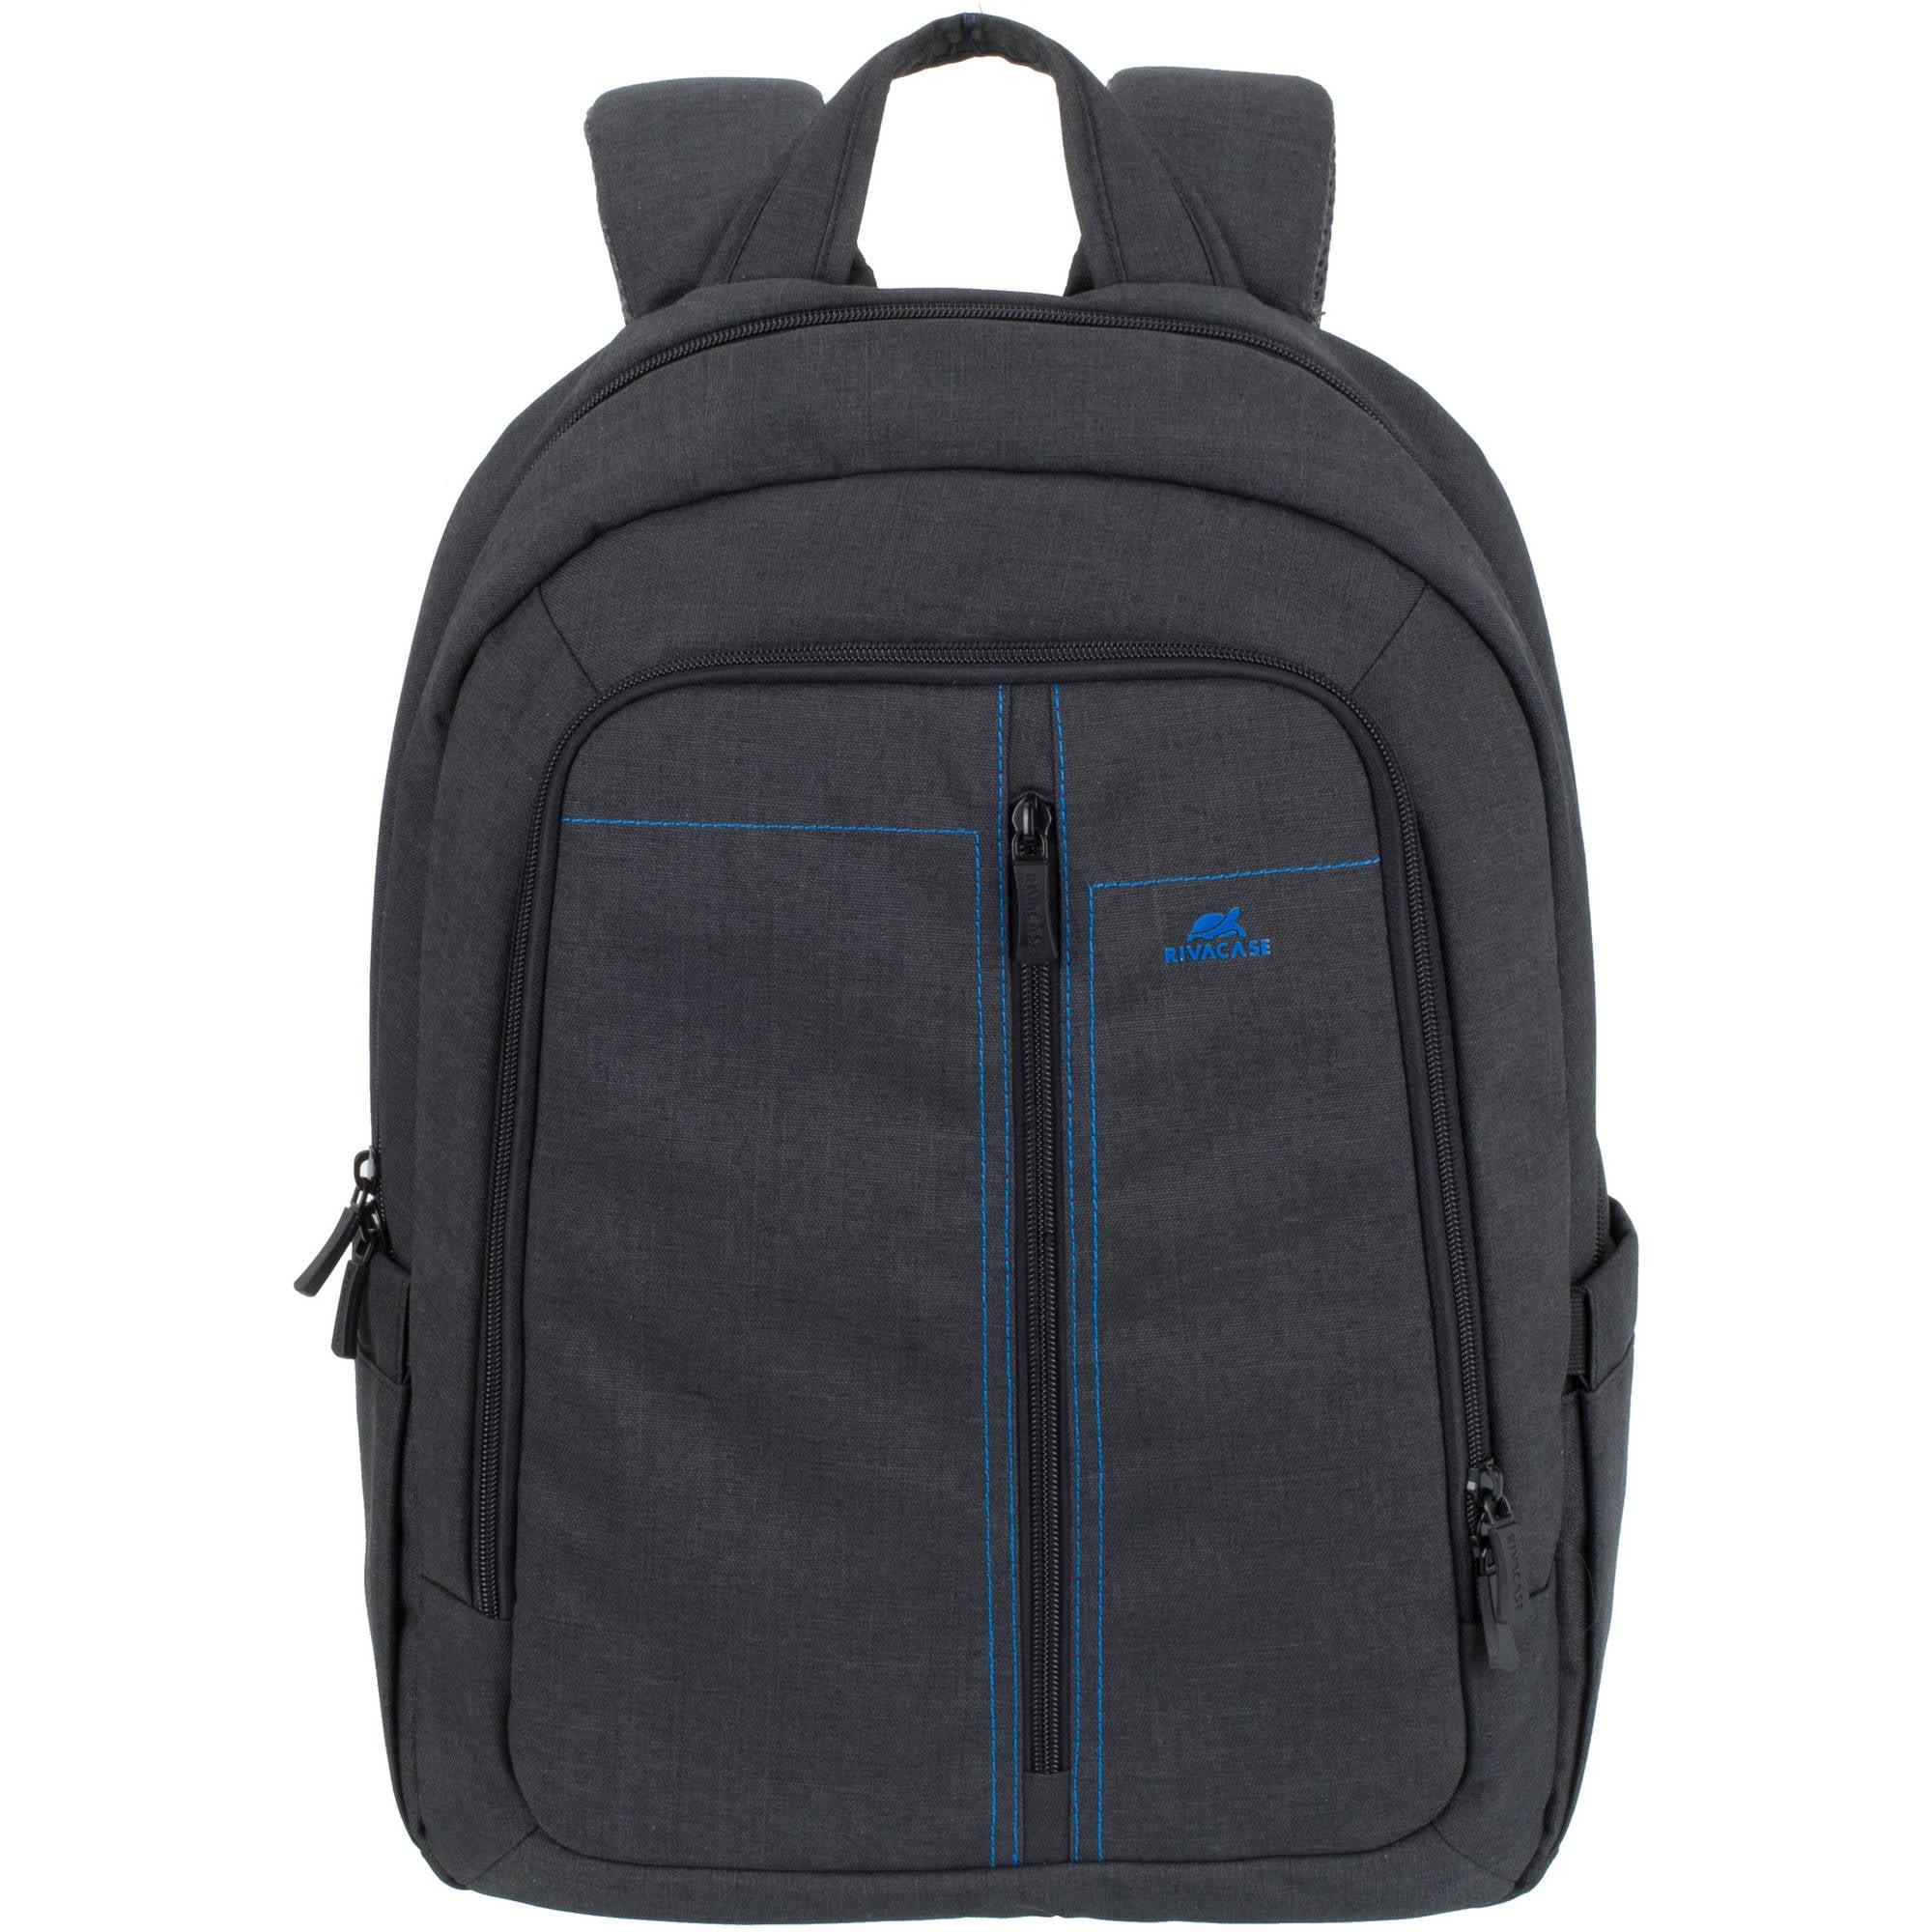 "RIVACASE 15.6"" Laptop Backpack 7560, Black"